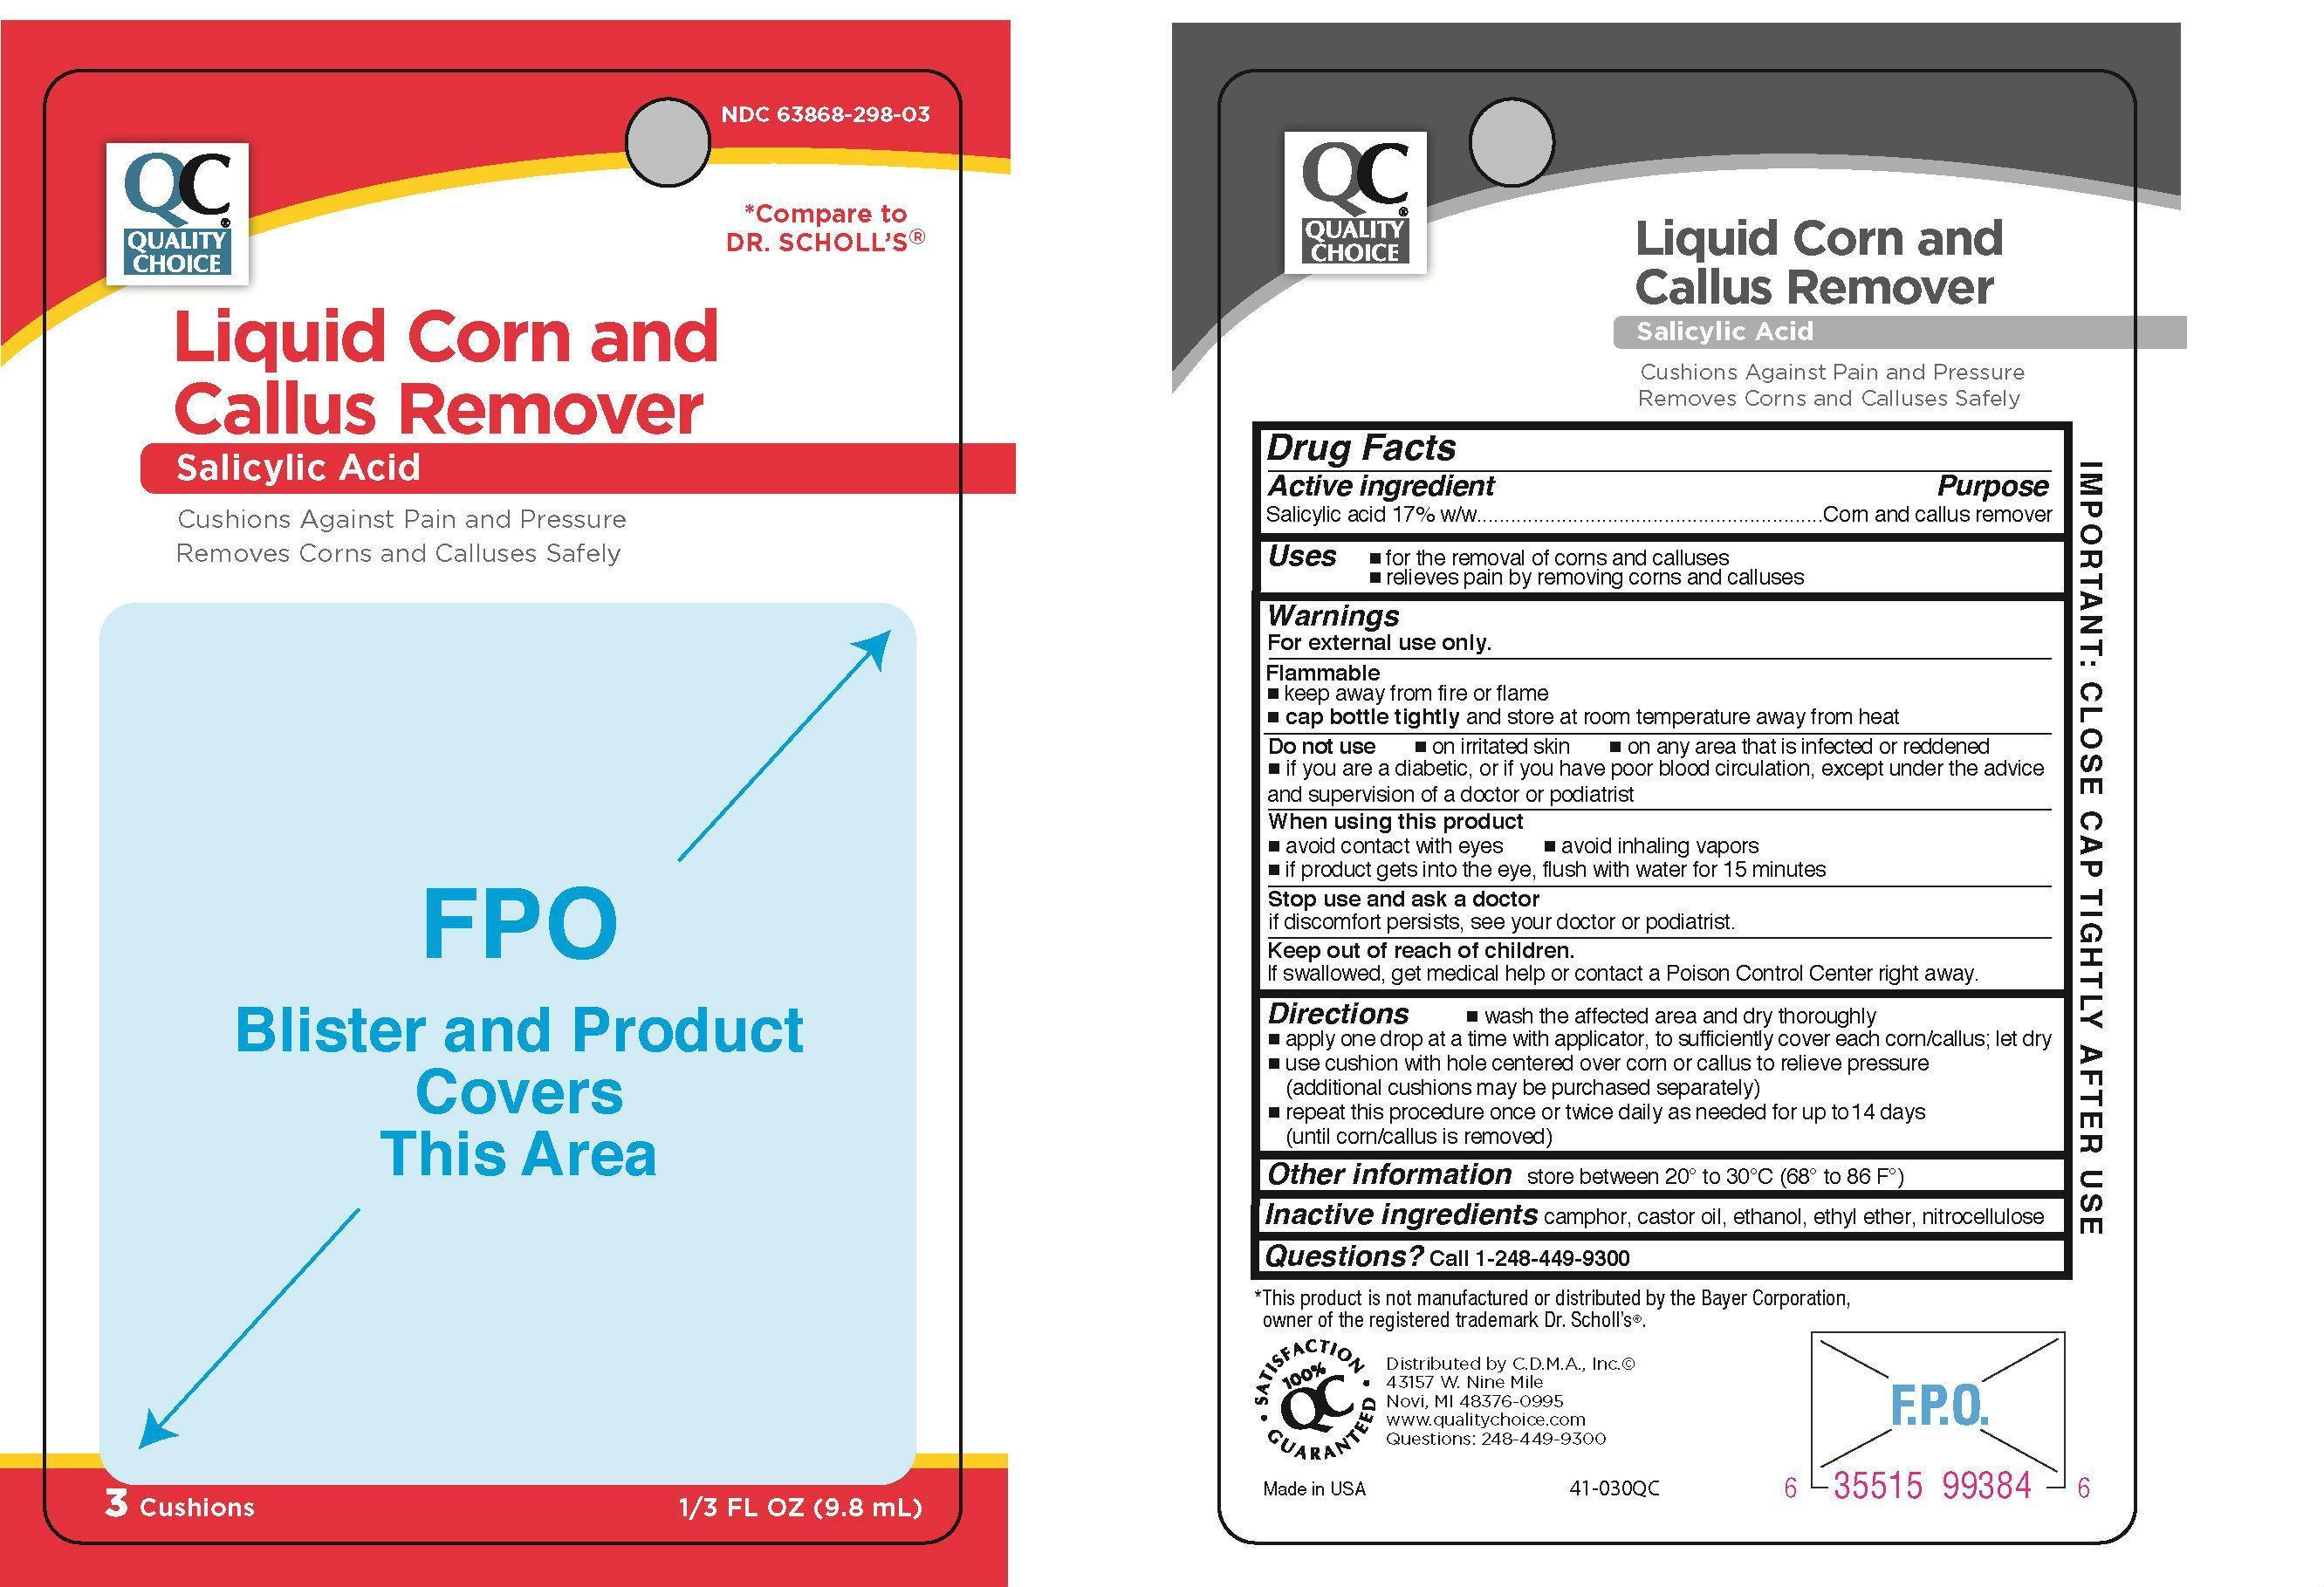 QC Liq Corn  Callus Card.jpg